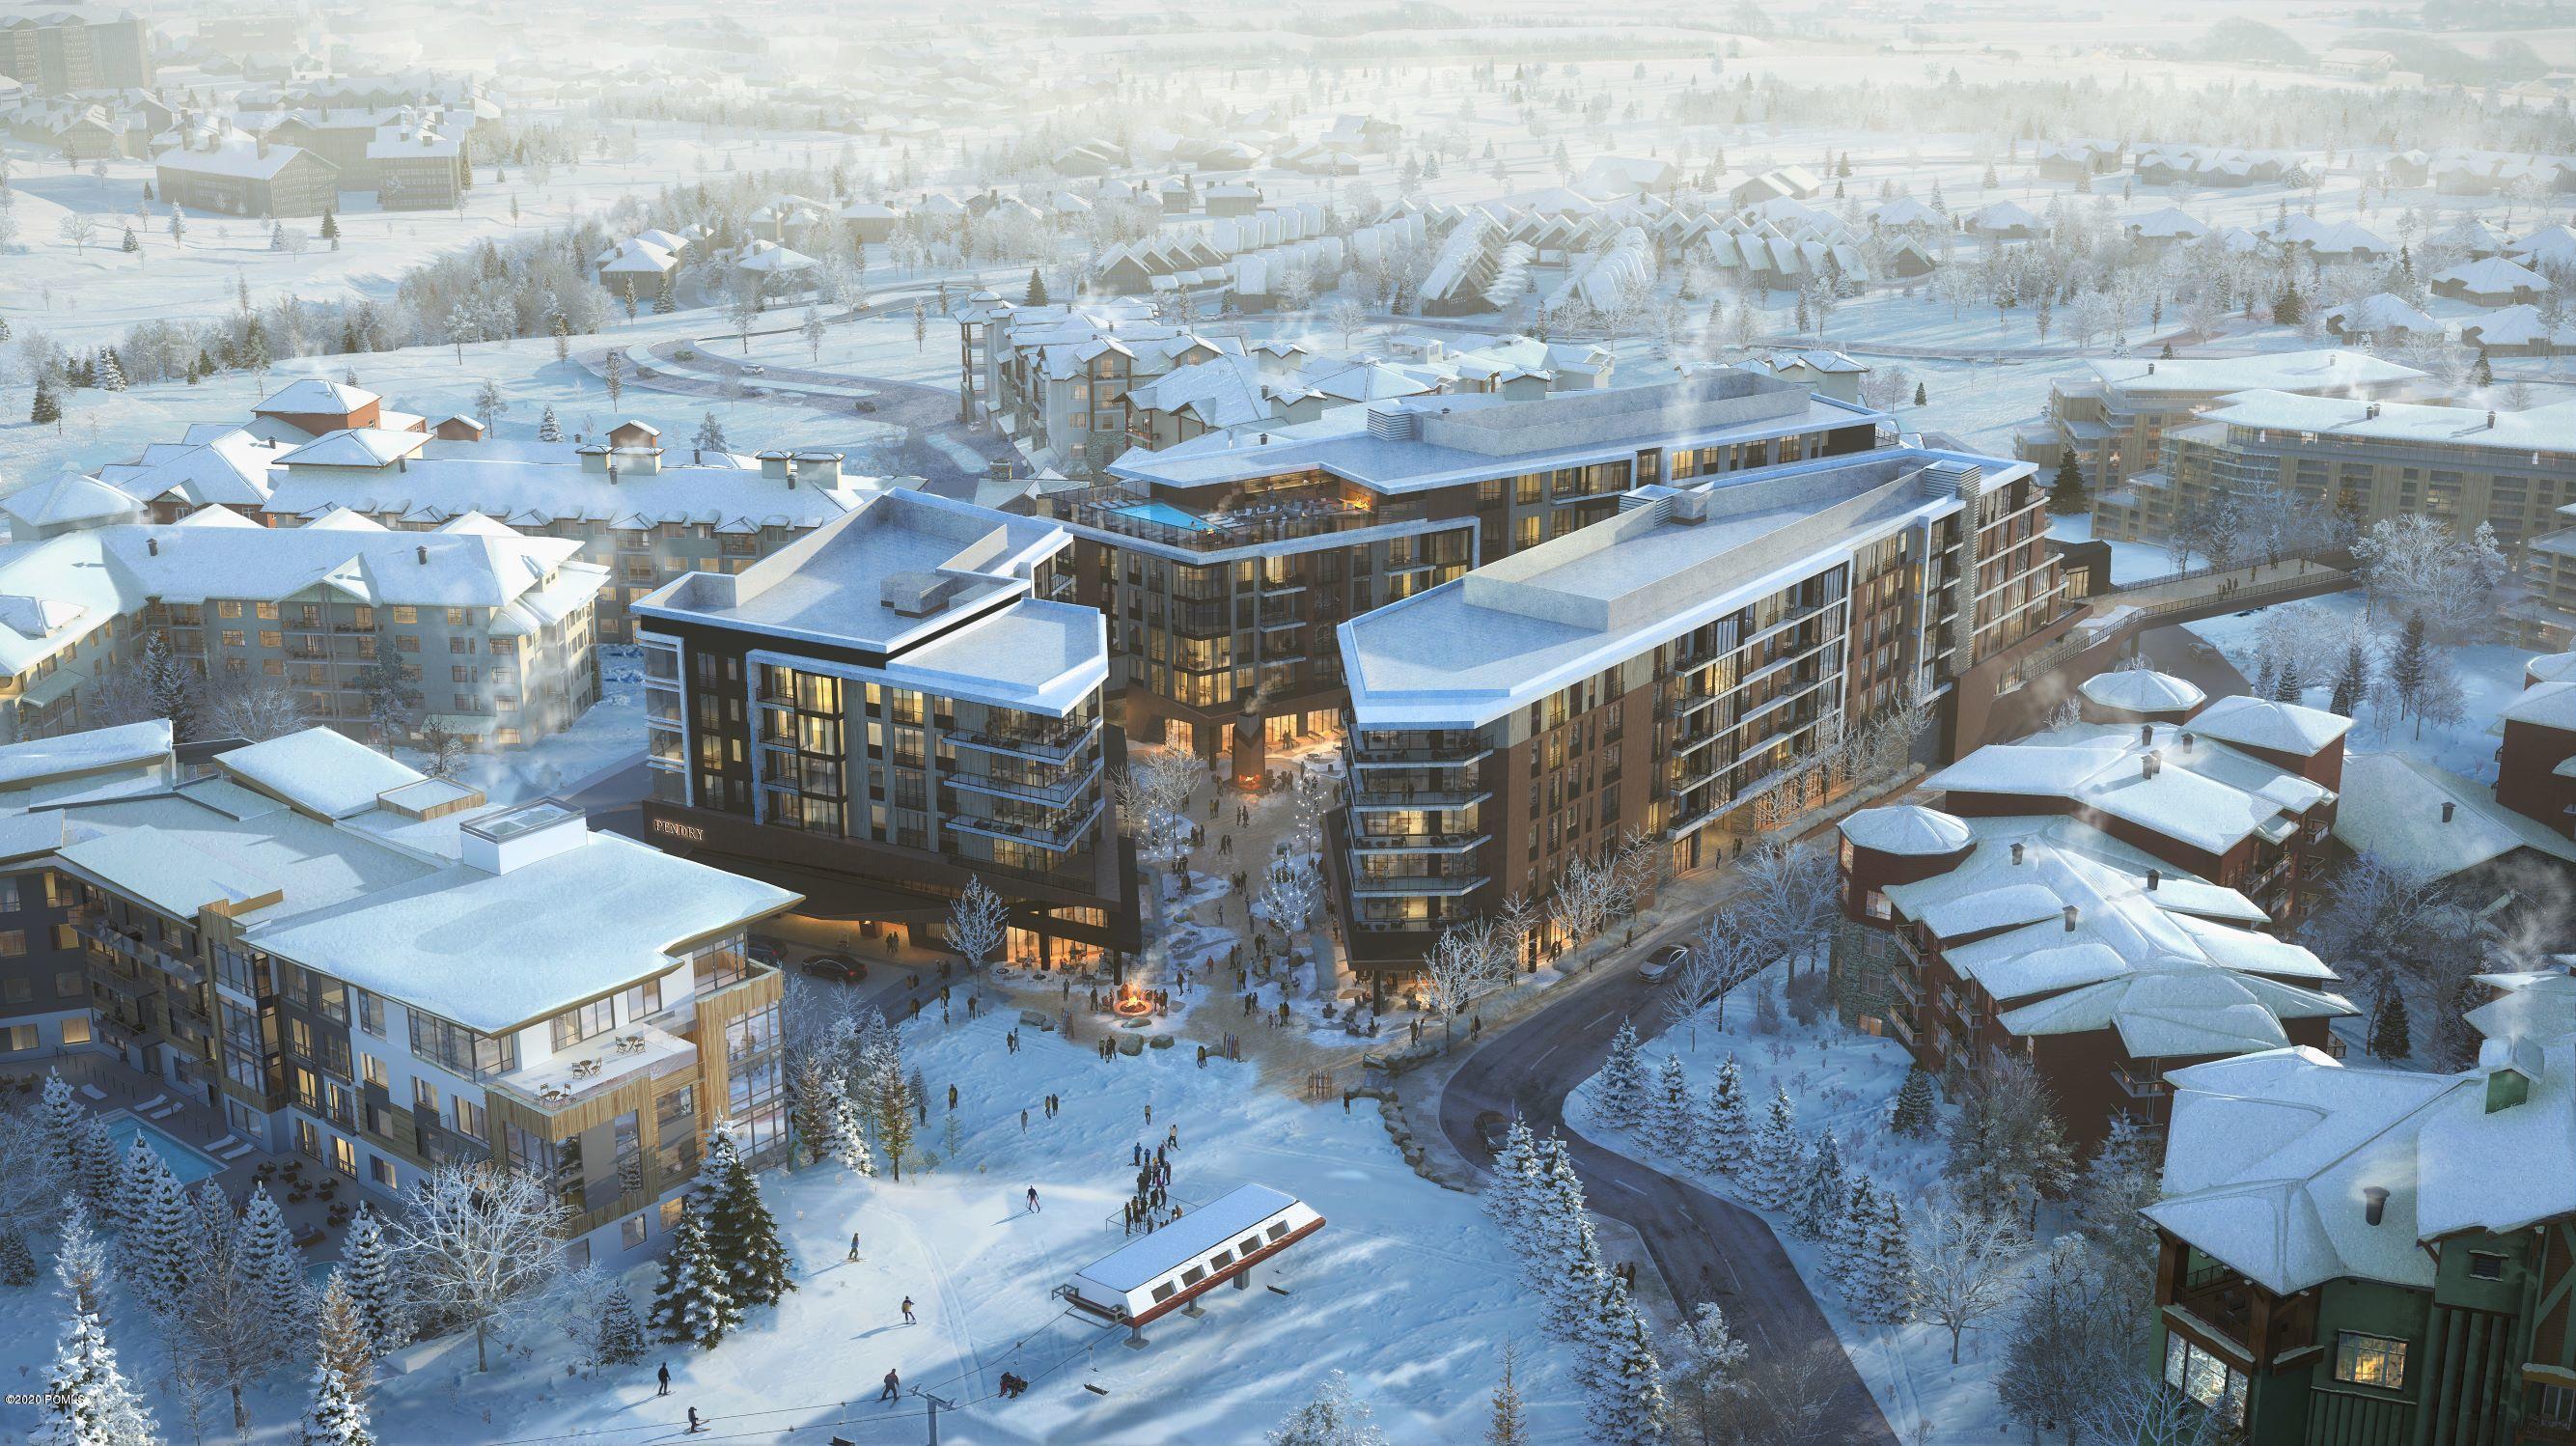 2417 High Mountain Road, Park City, Utah 84060, 2 Bedrooms Bedrooms, ,3 BathroomsBathrooms,Condominium,For Sale,High Mountain,12004372